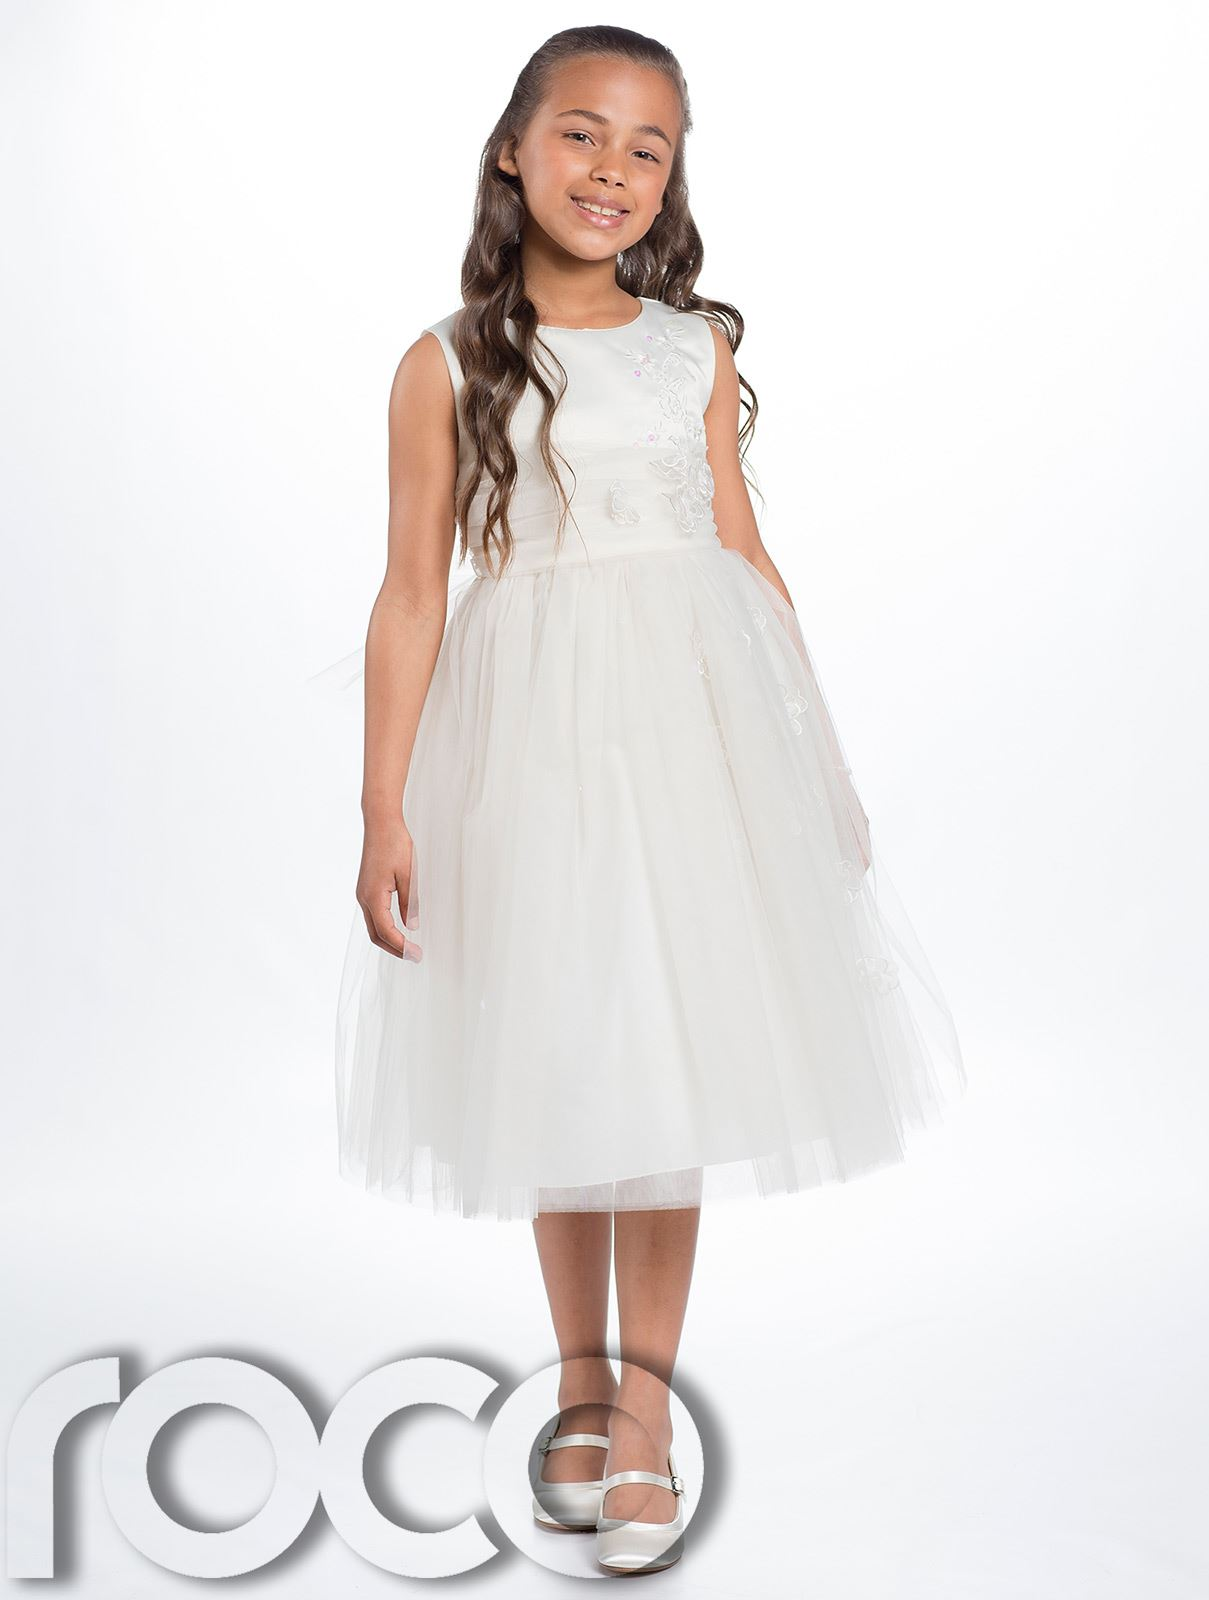 Fleur filles robe demoiselle d 39 honneur robes filles robe for Fleurs fille robes mariage